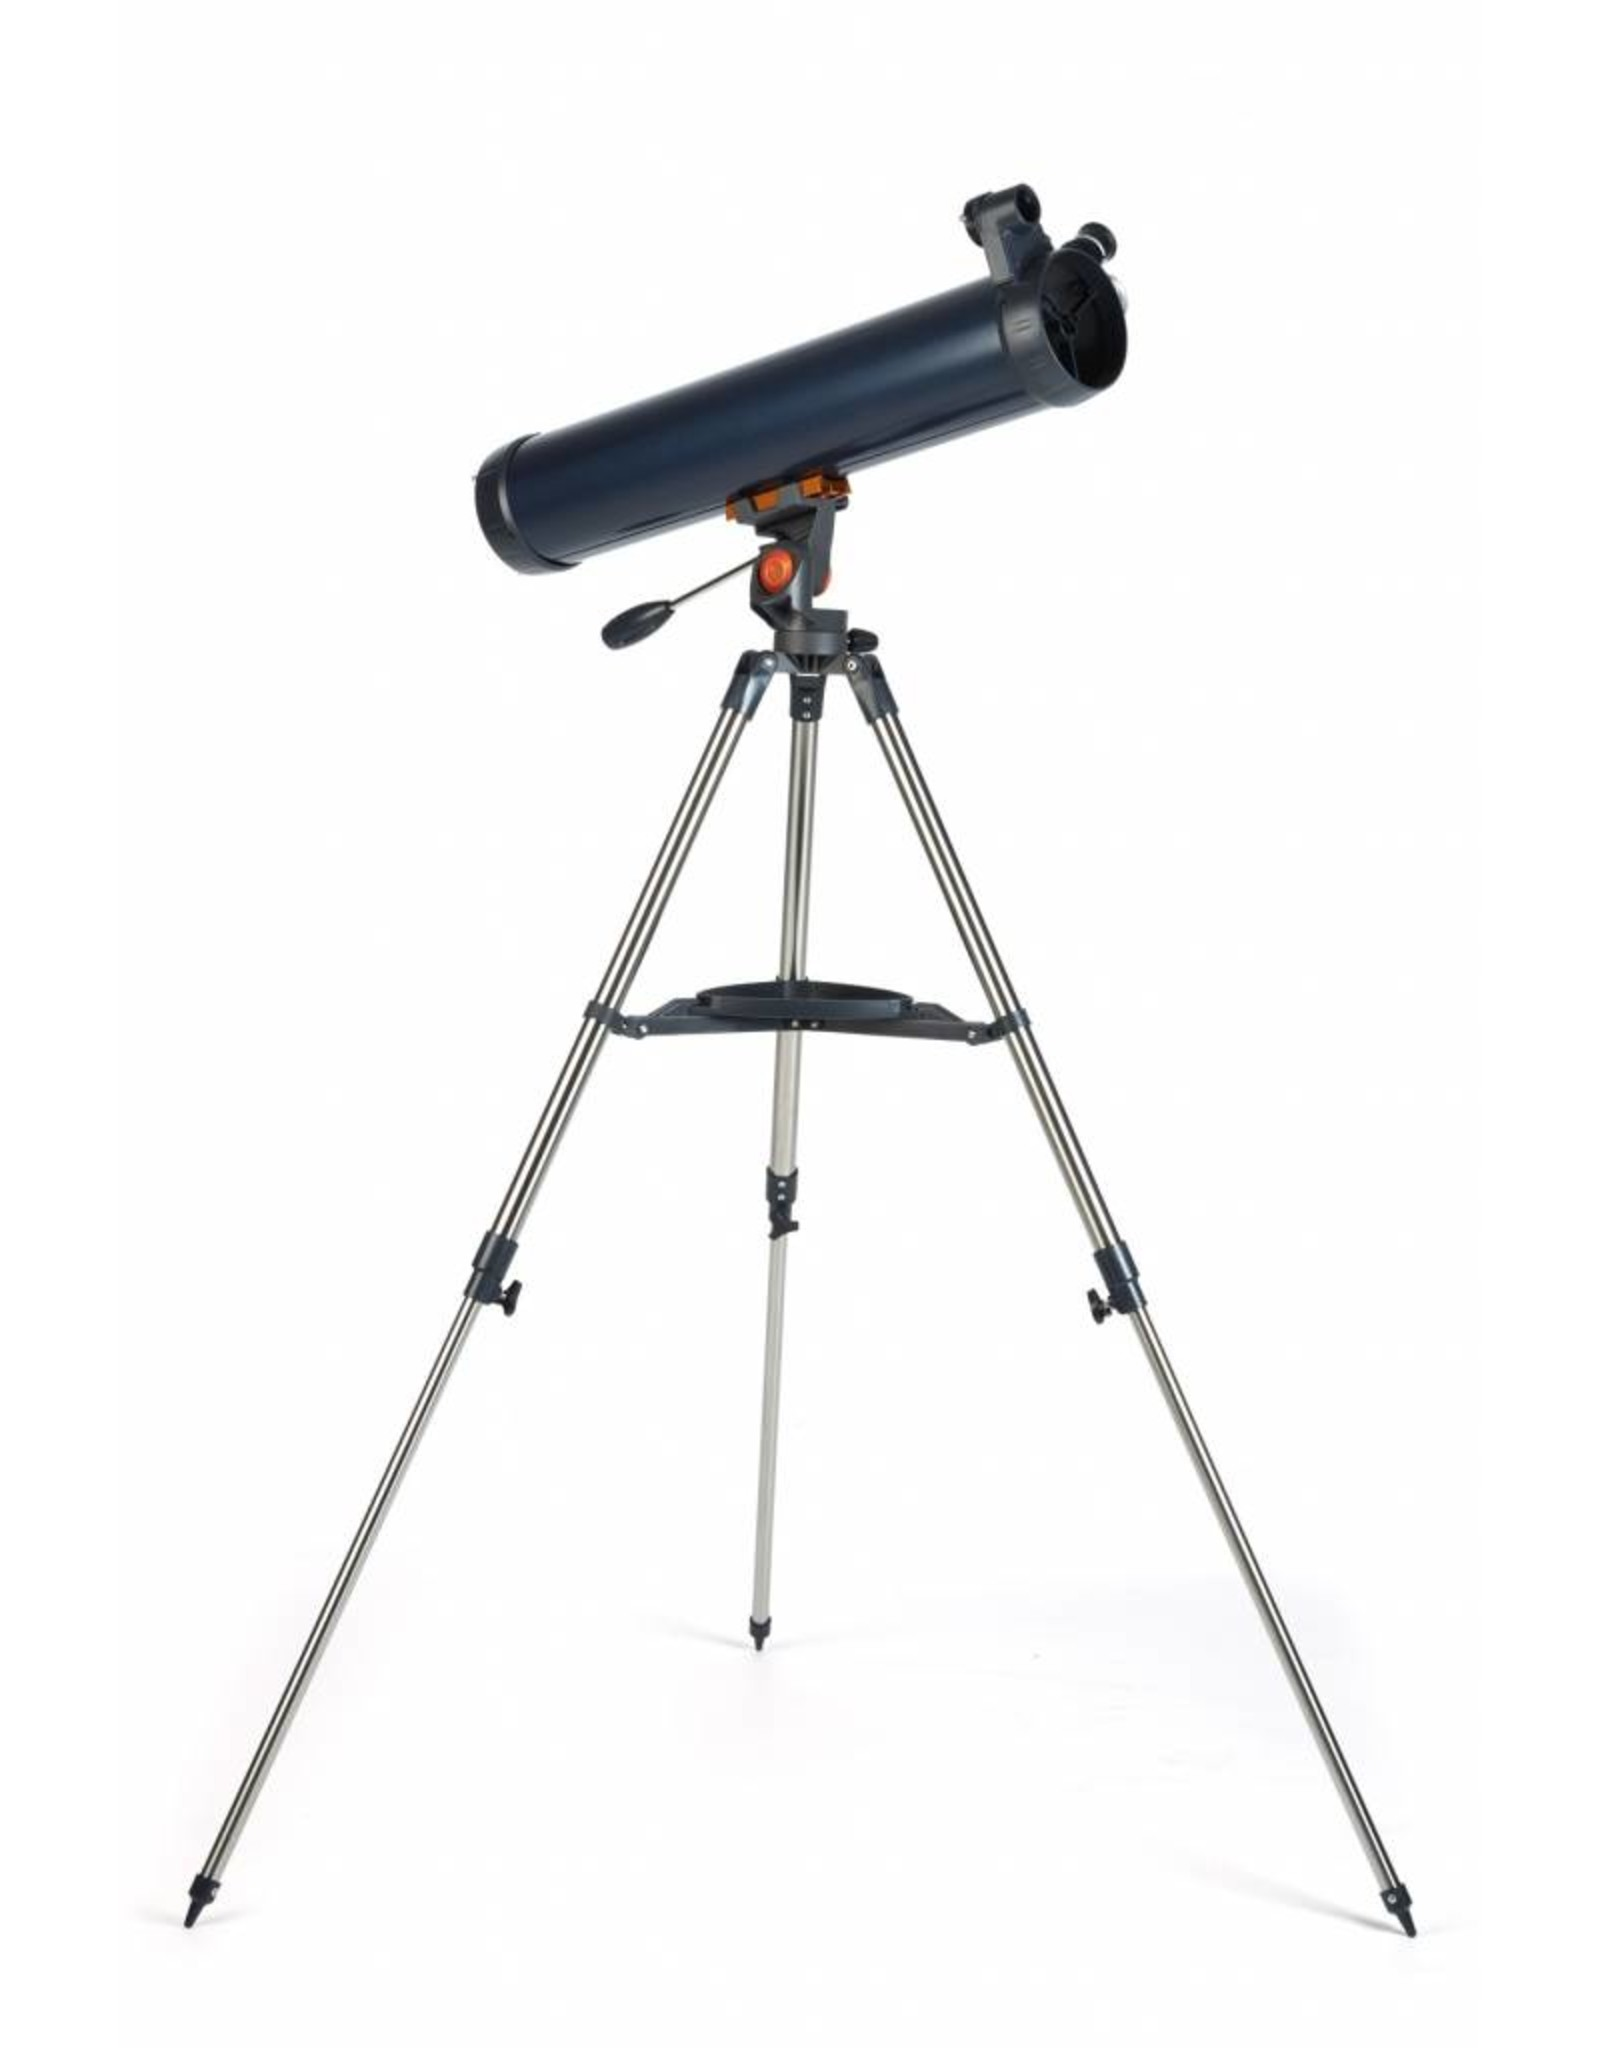 Celestron Celestron AstroMaster LT 76AZ Telescope